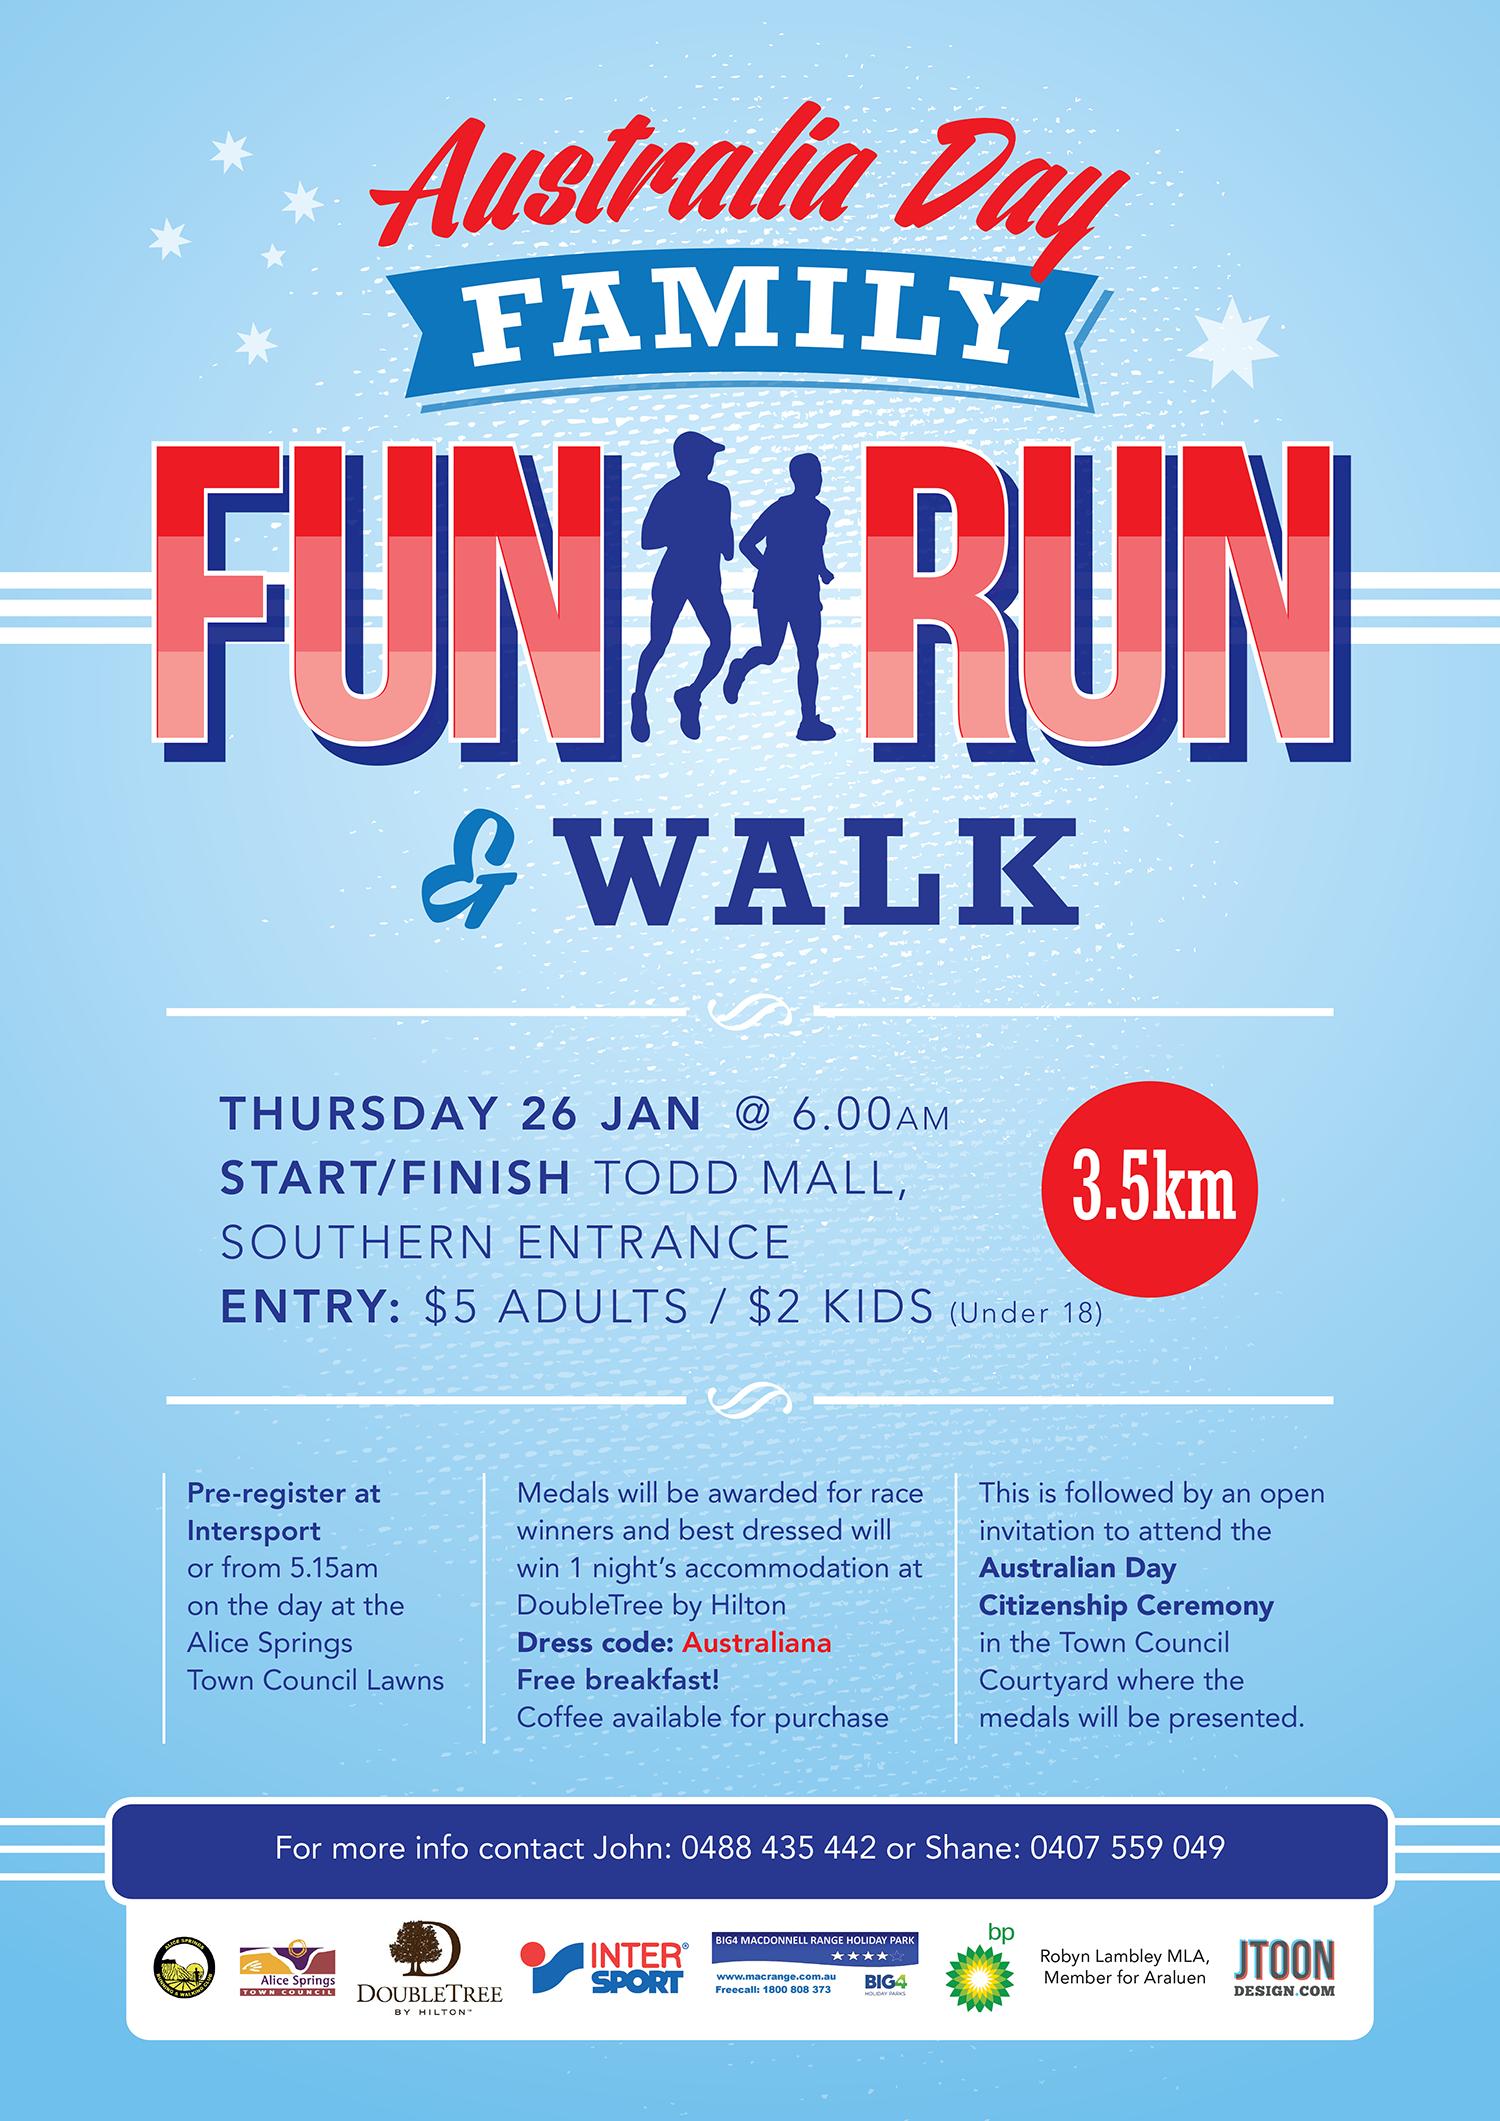 australia day family fun run  u0026 walk  26th jan 2017